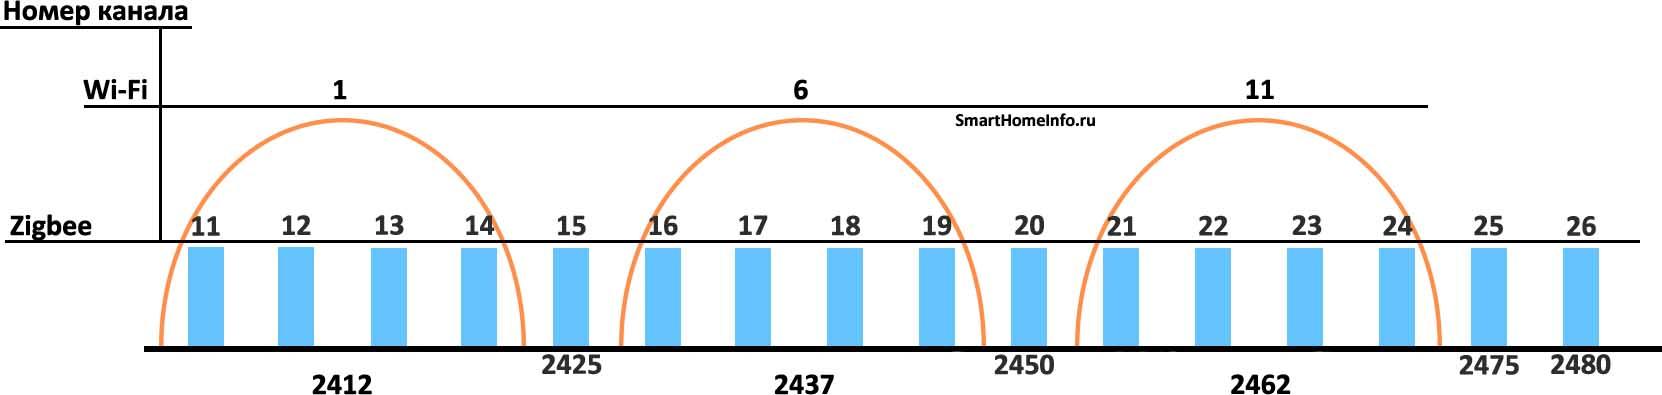 Пересечение Wi-Fi и Zigbee каналов в частоте 2.4 ГГц